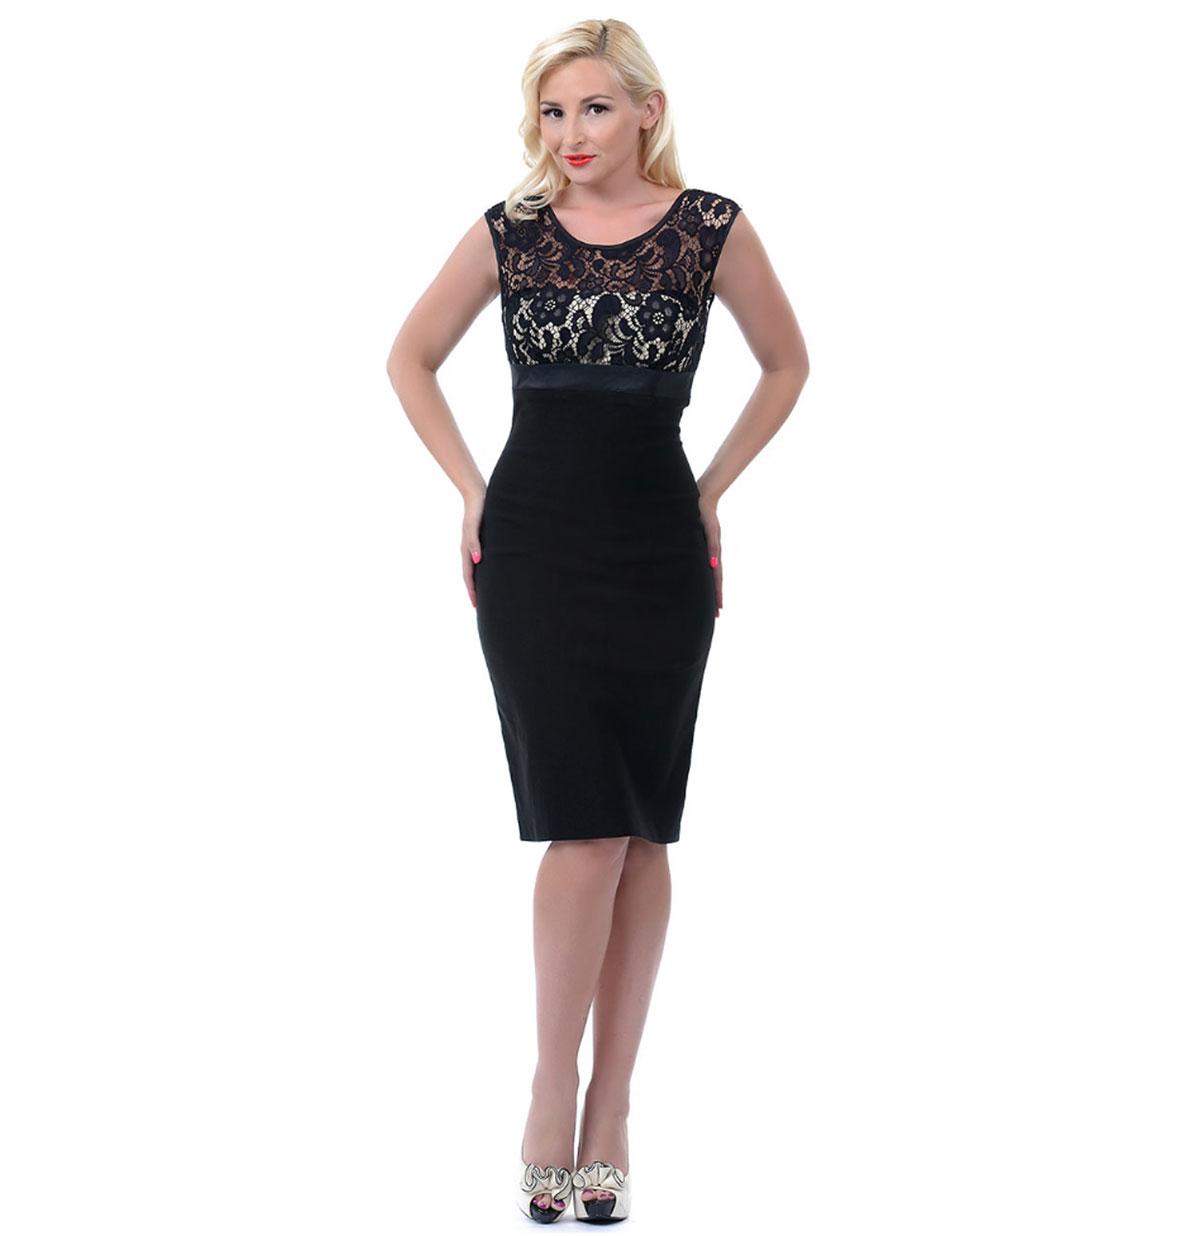 Lana Dress, Black and Nude